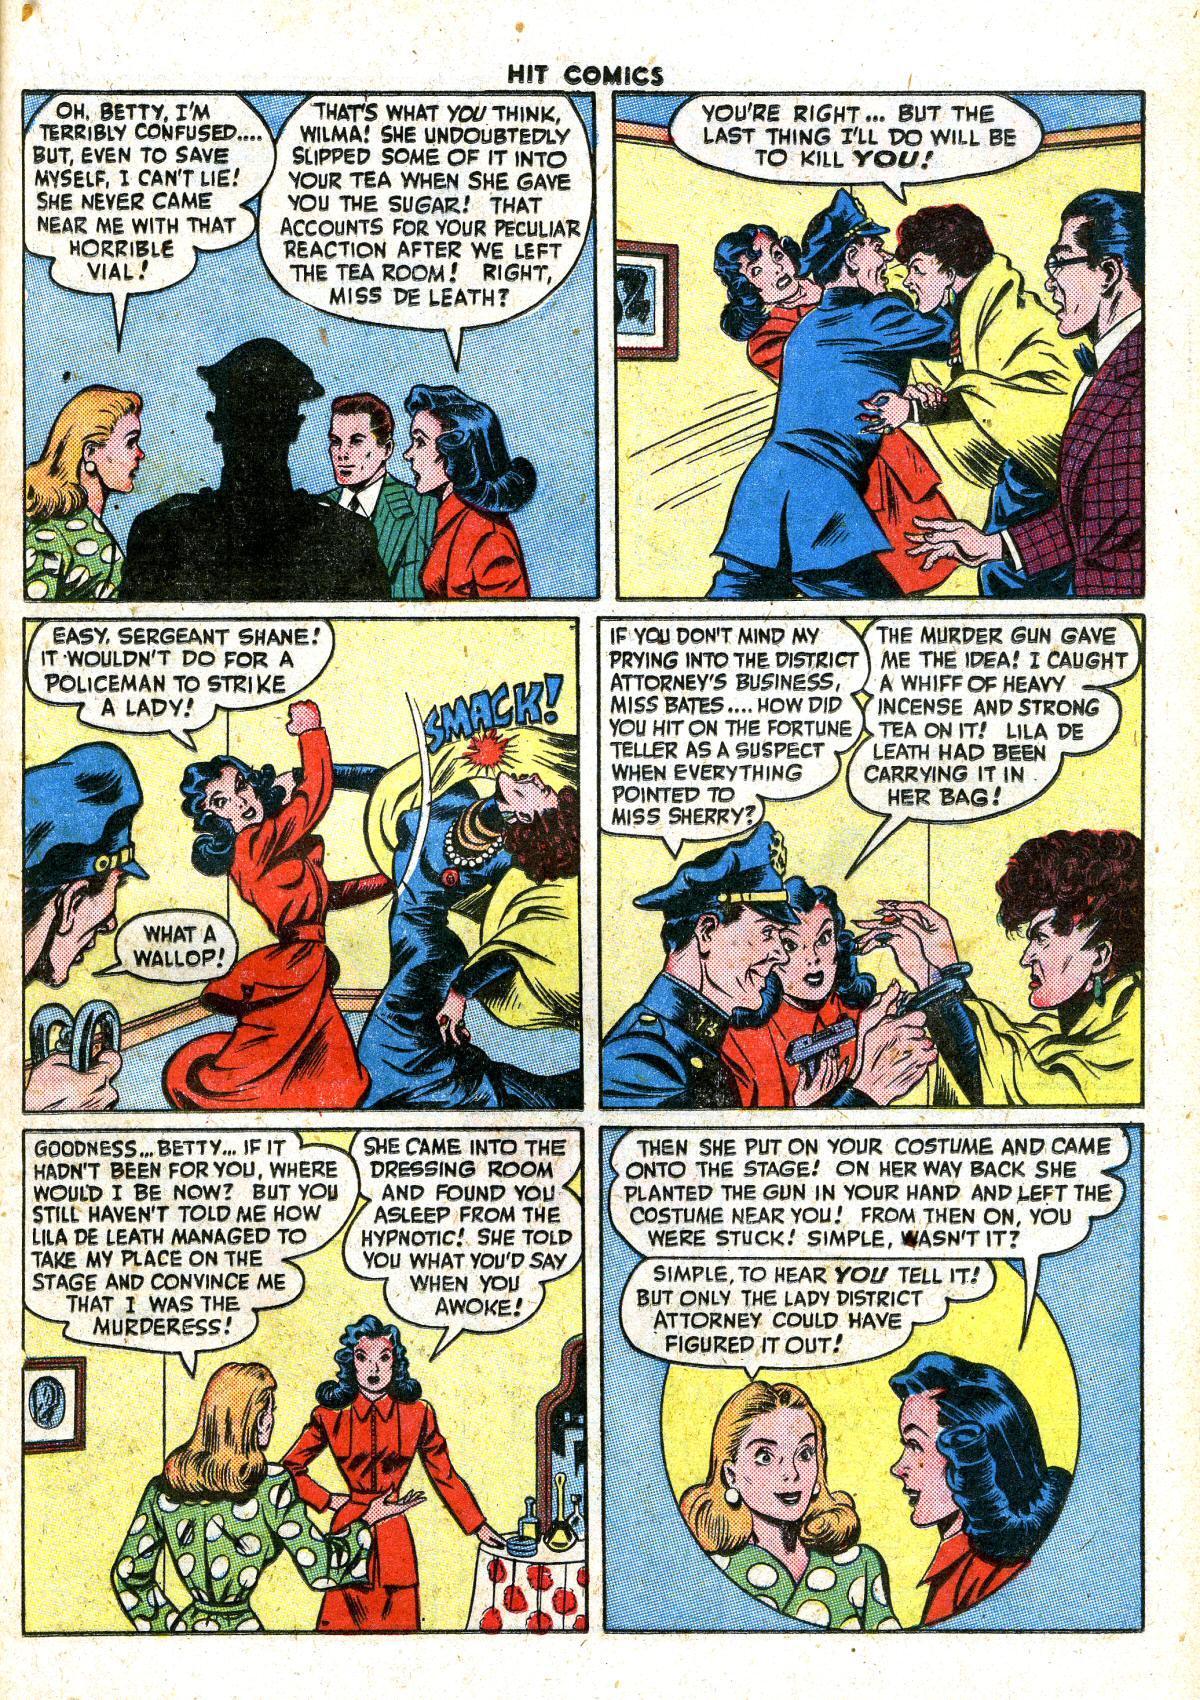 Read online Hit Comics comic -  Issue #41 - 37